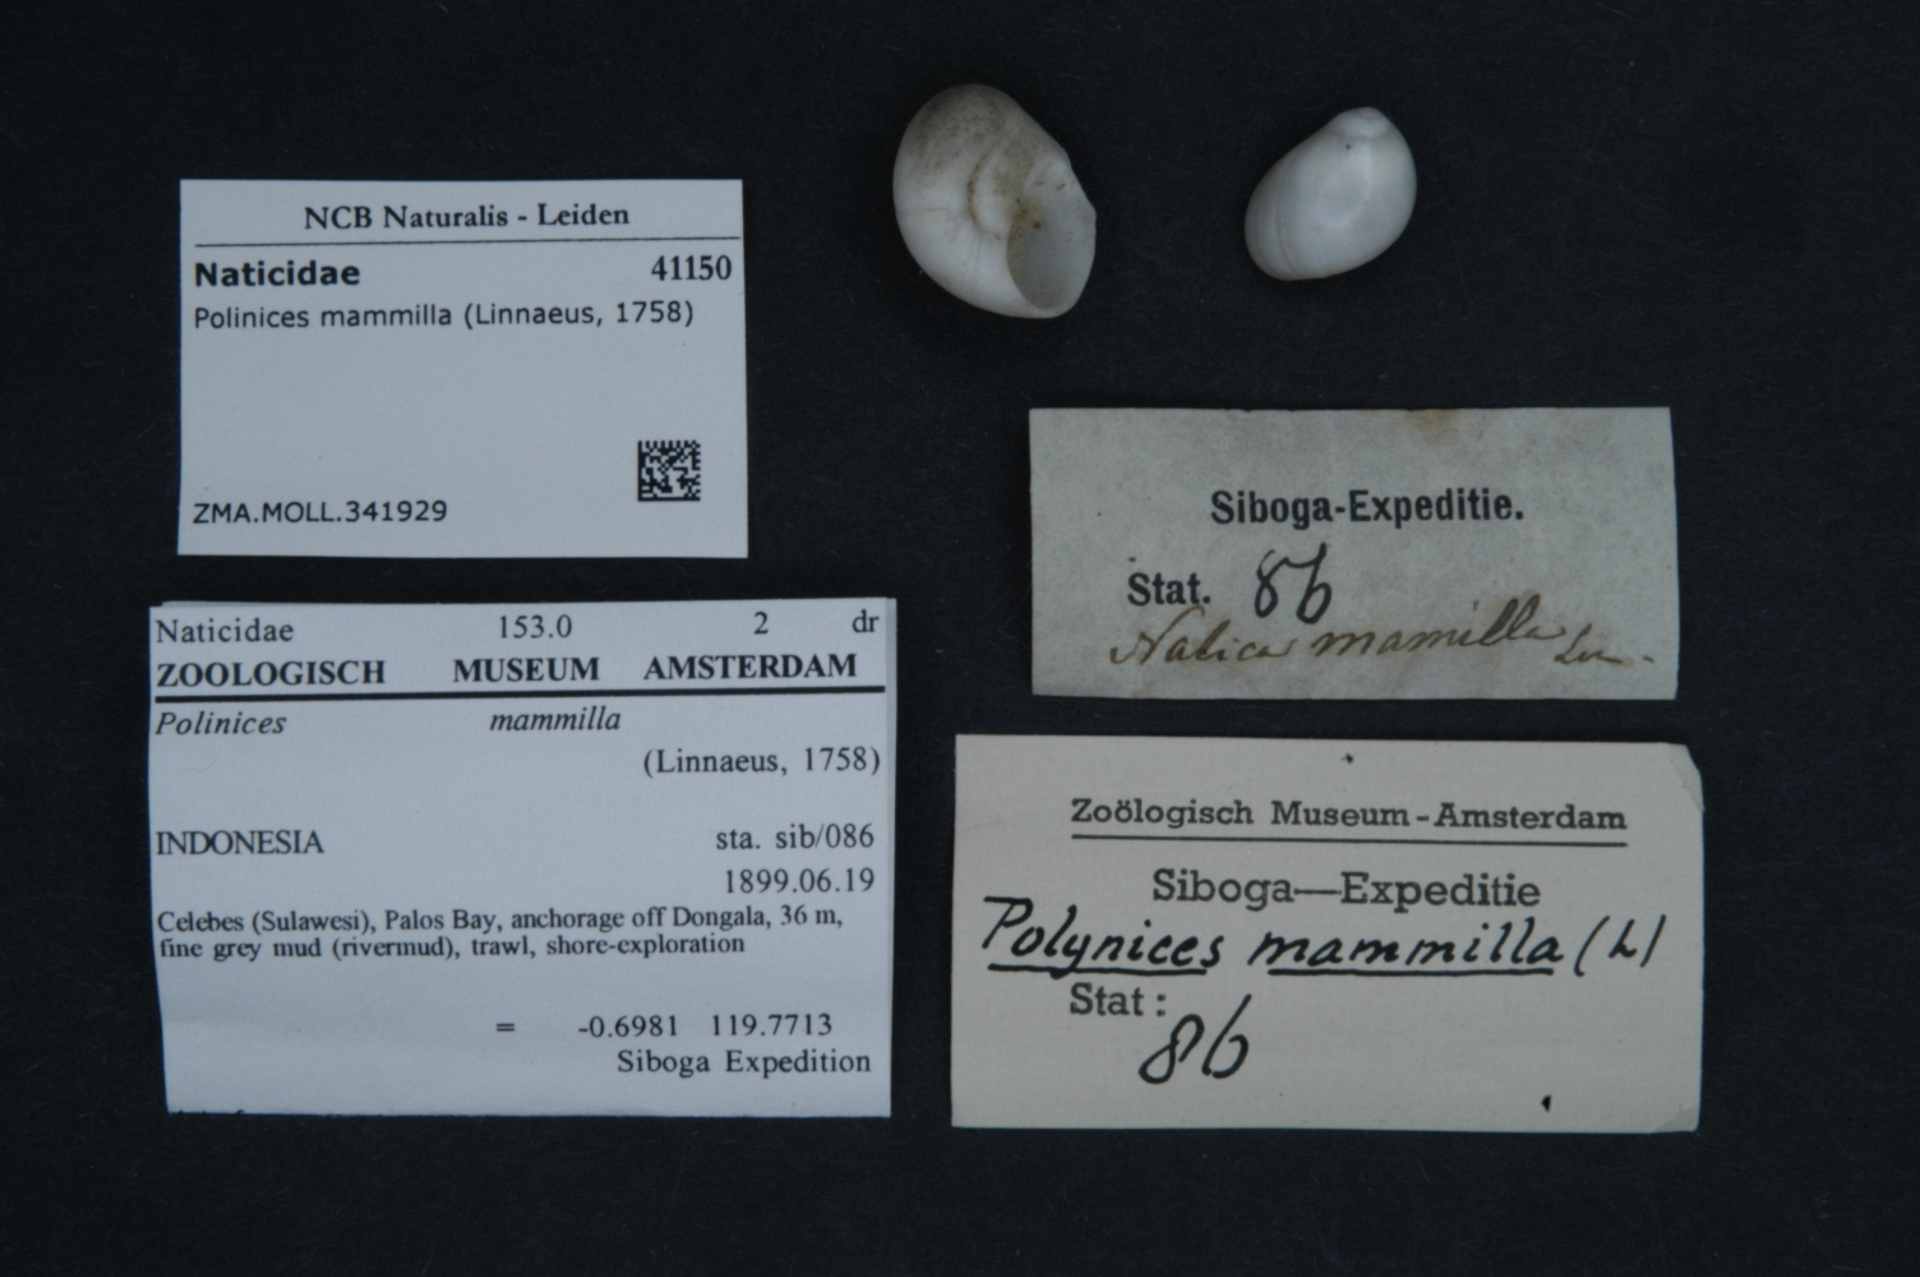 ZMA.MOLL.341929 | Polinices mammilla (Linnaeus, 1758)